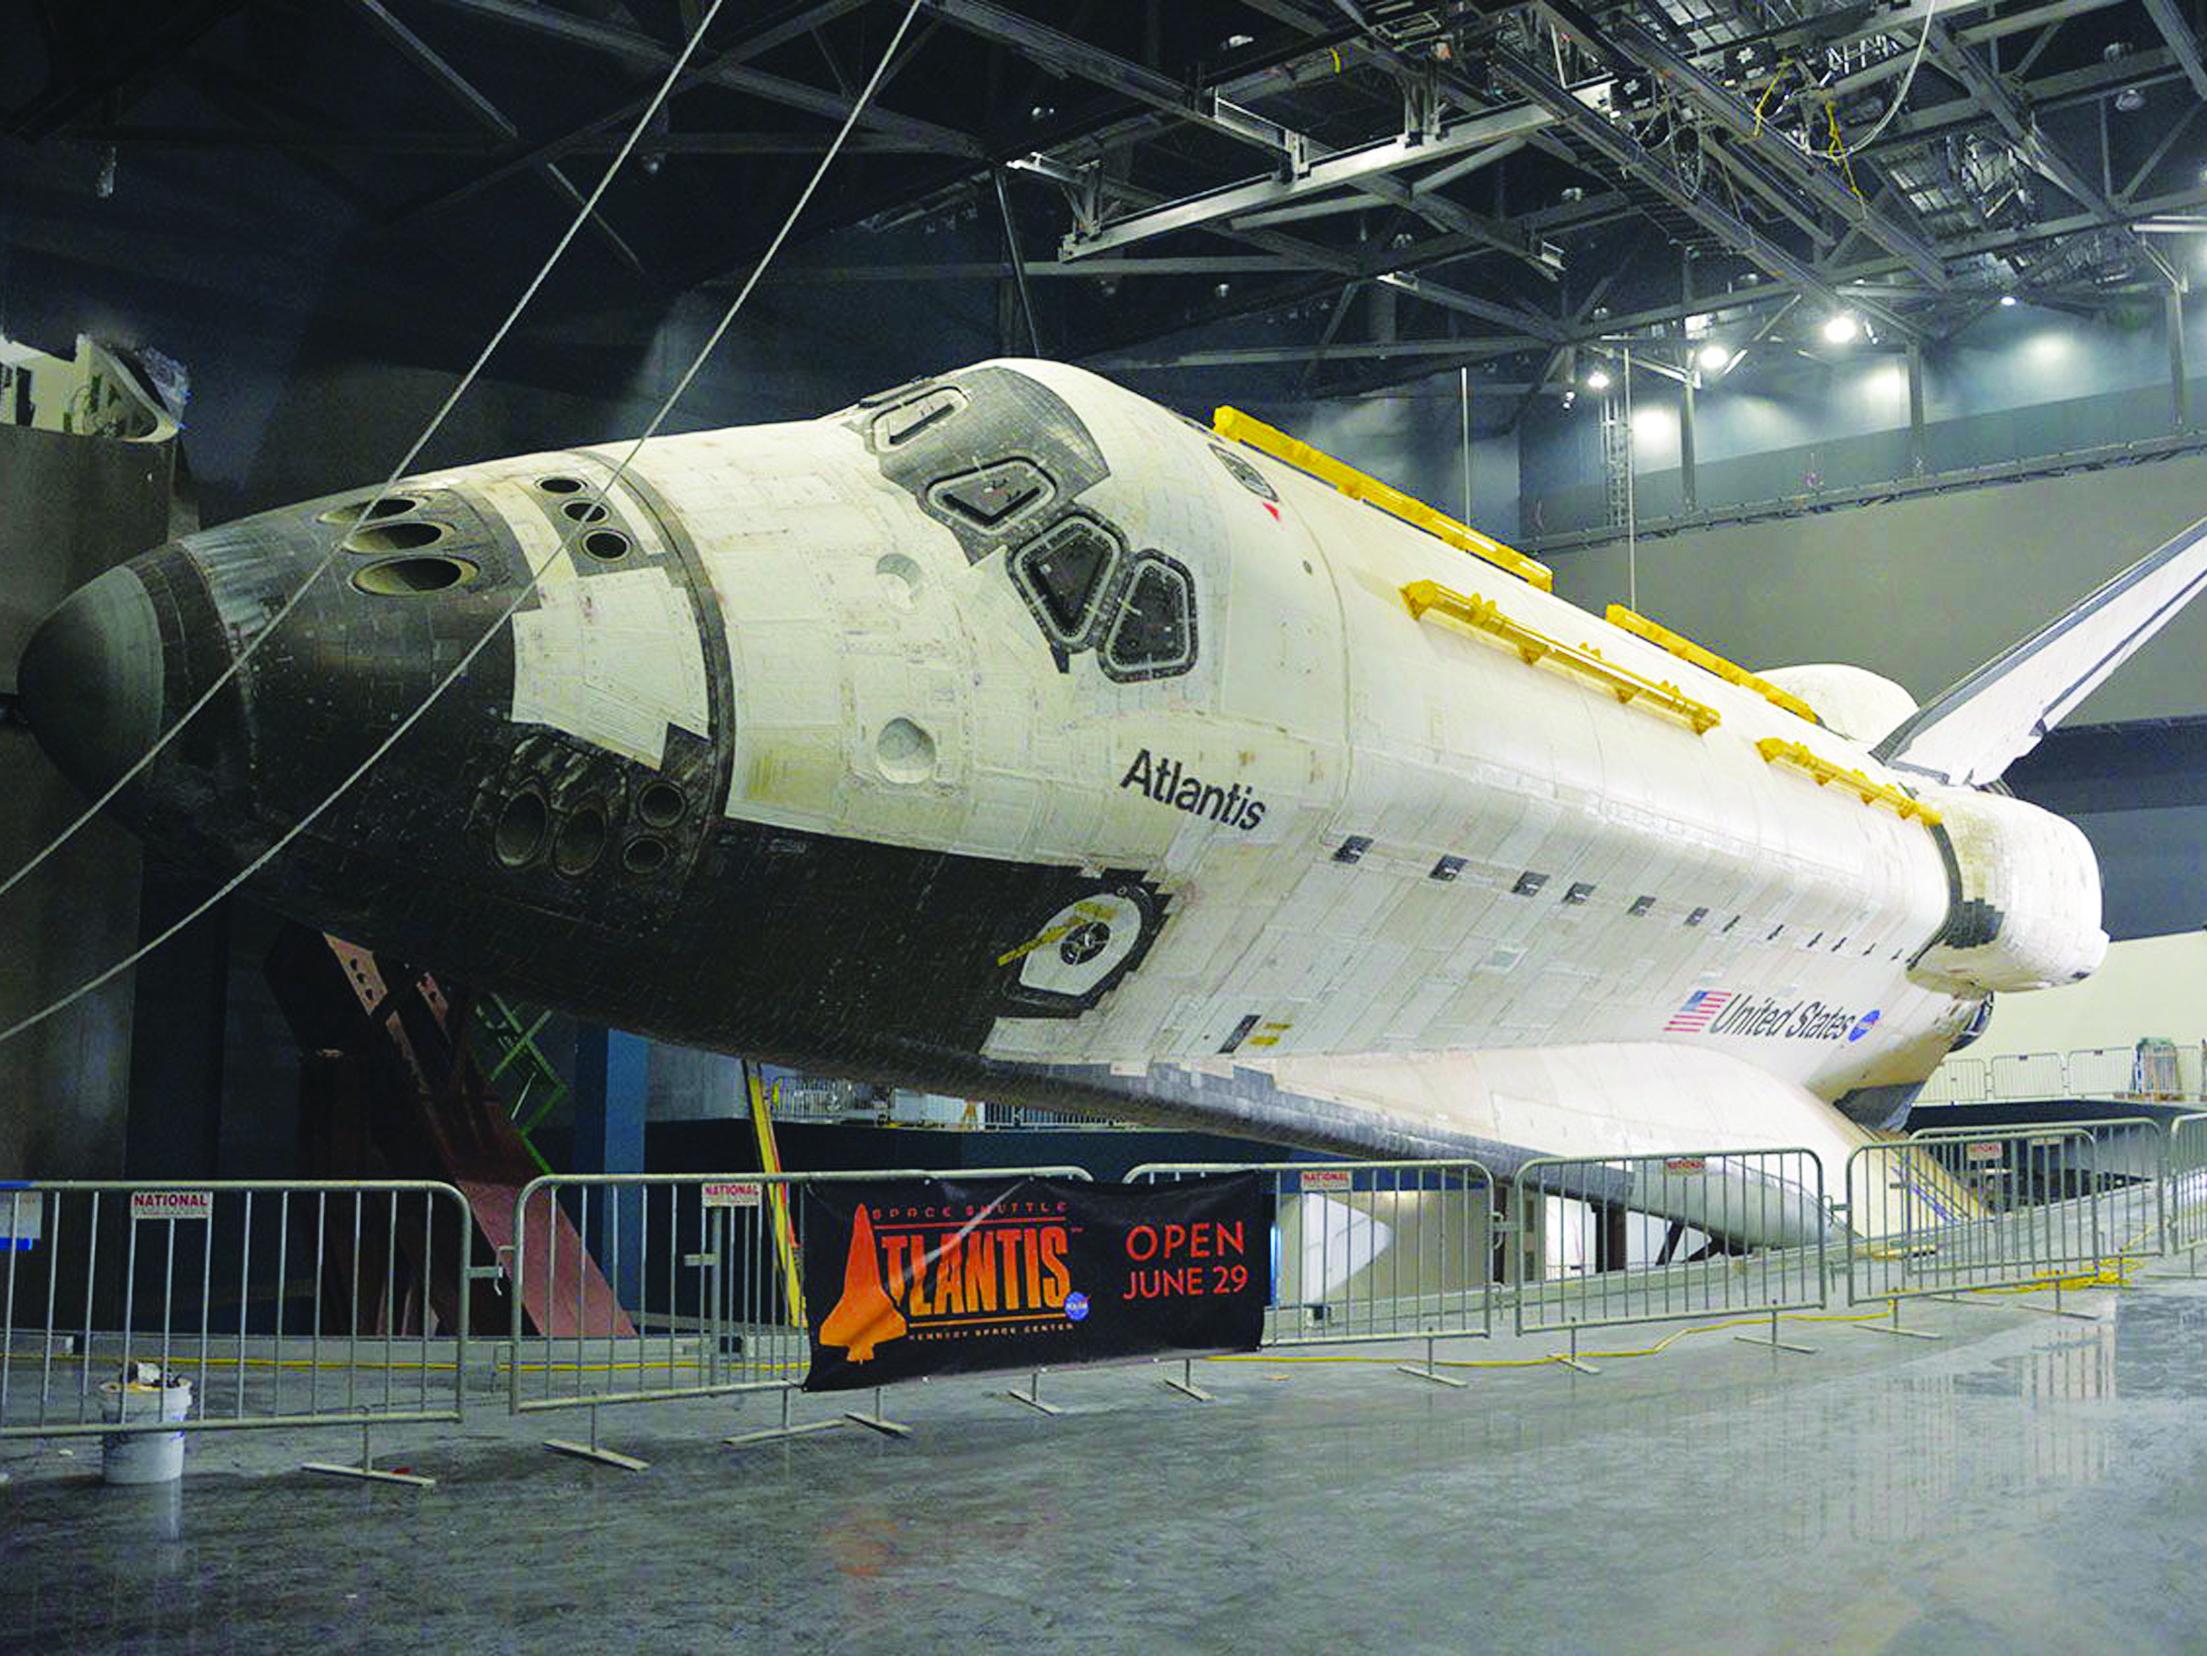 Space Shuttle Atlantis Fully Unwrapped for NASA Exhibit - SpaceNews.com